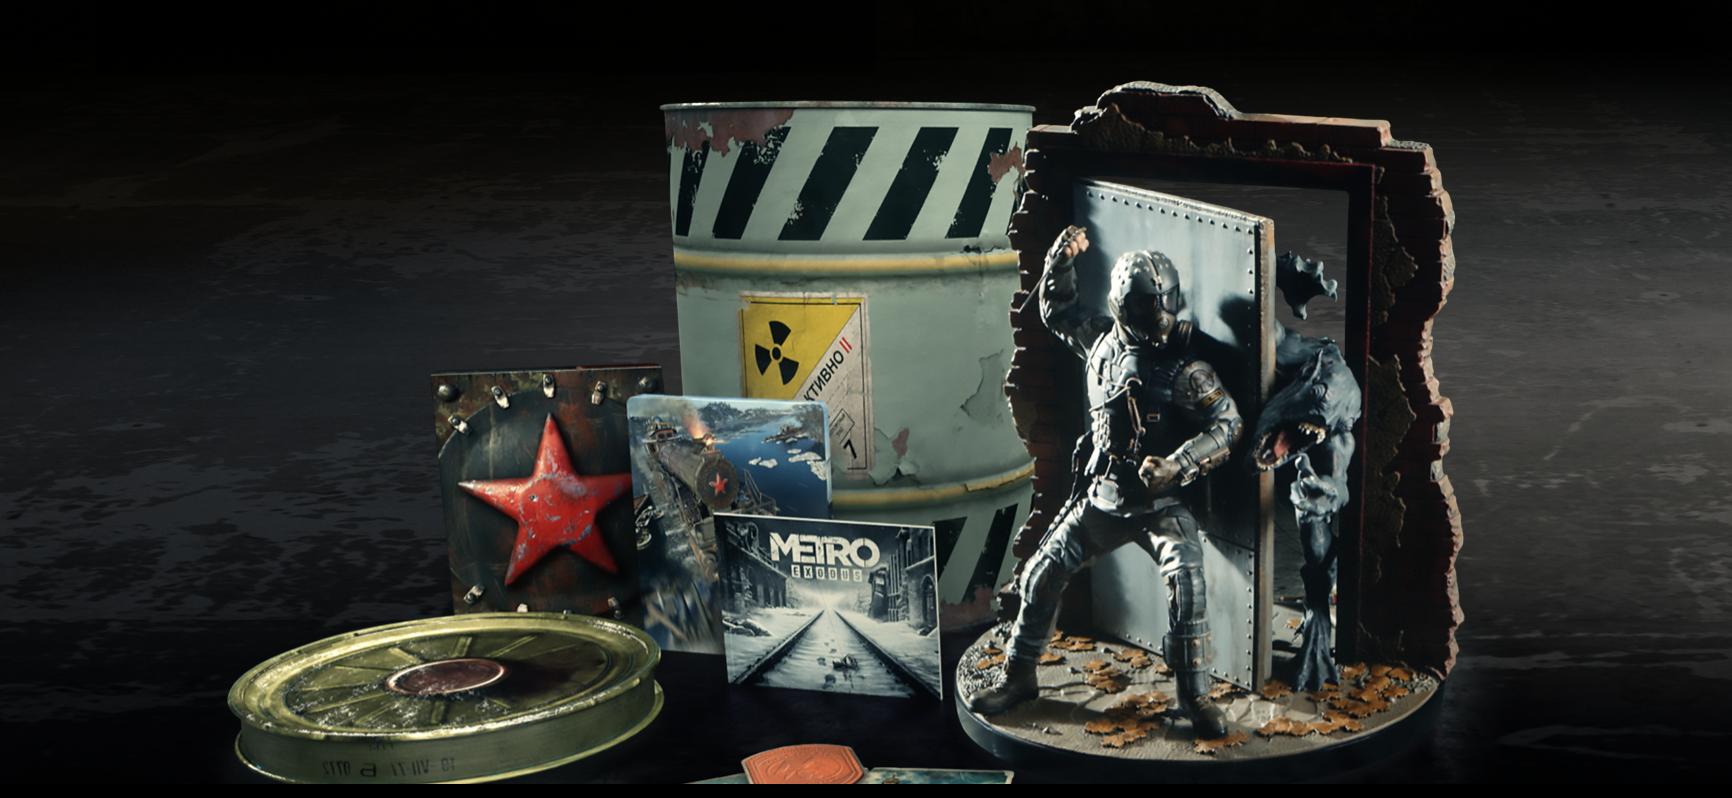 Metro Exodus Spartan Collector's Edition